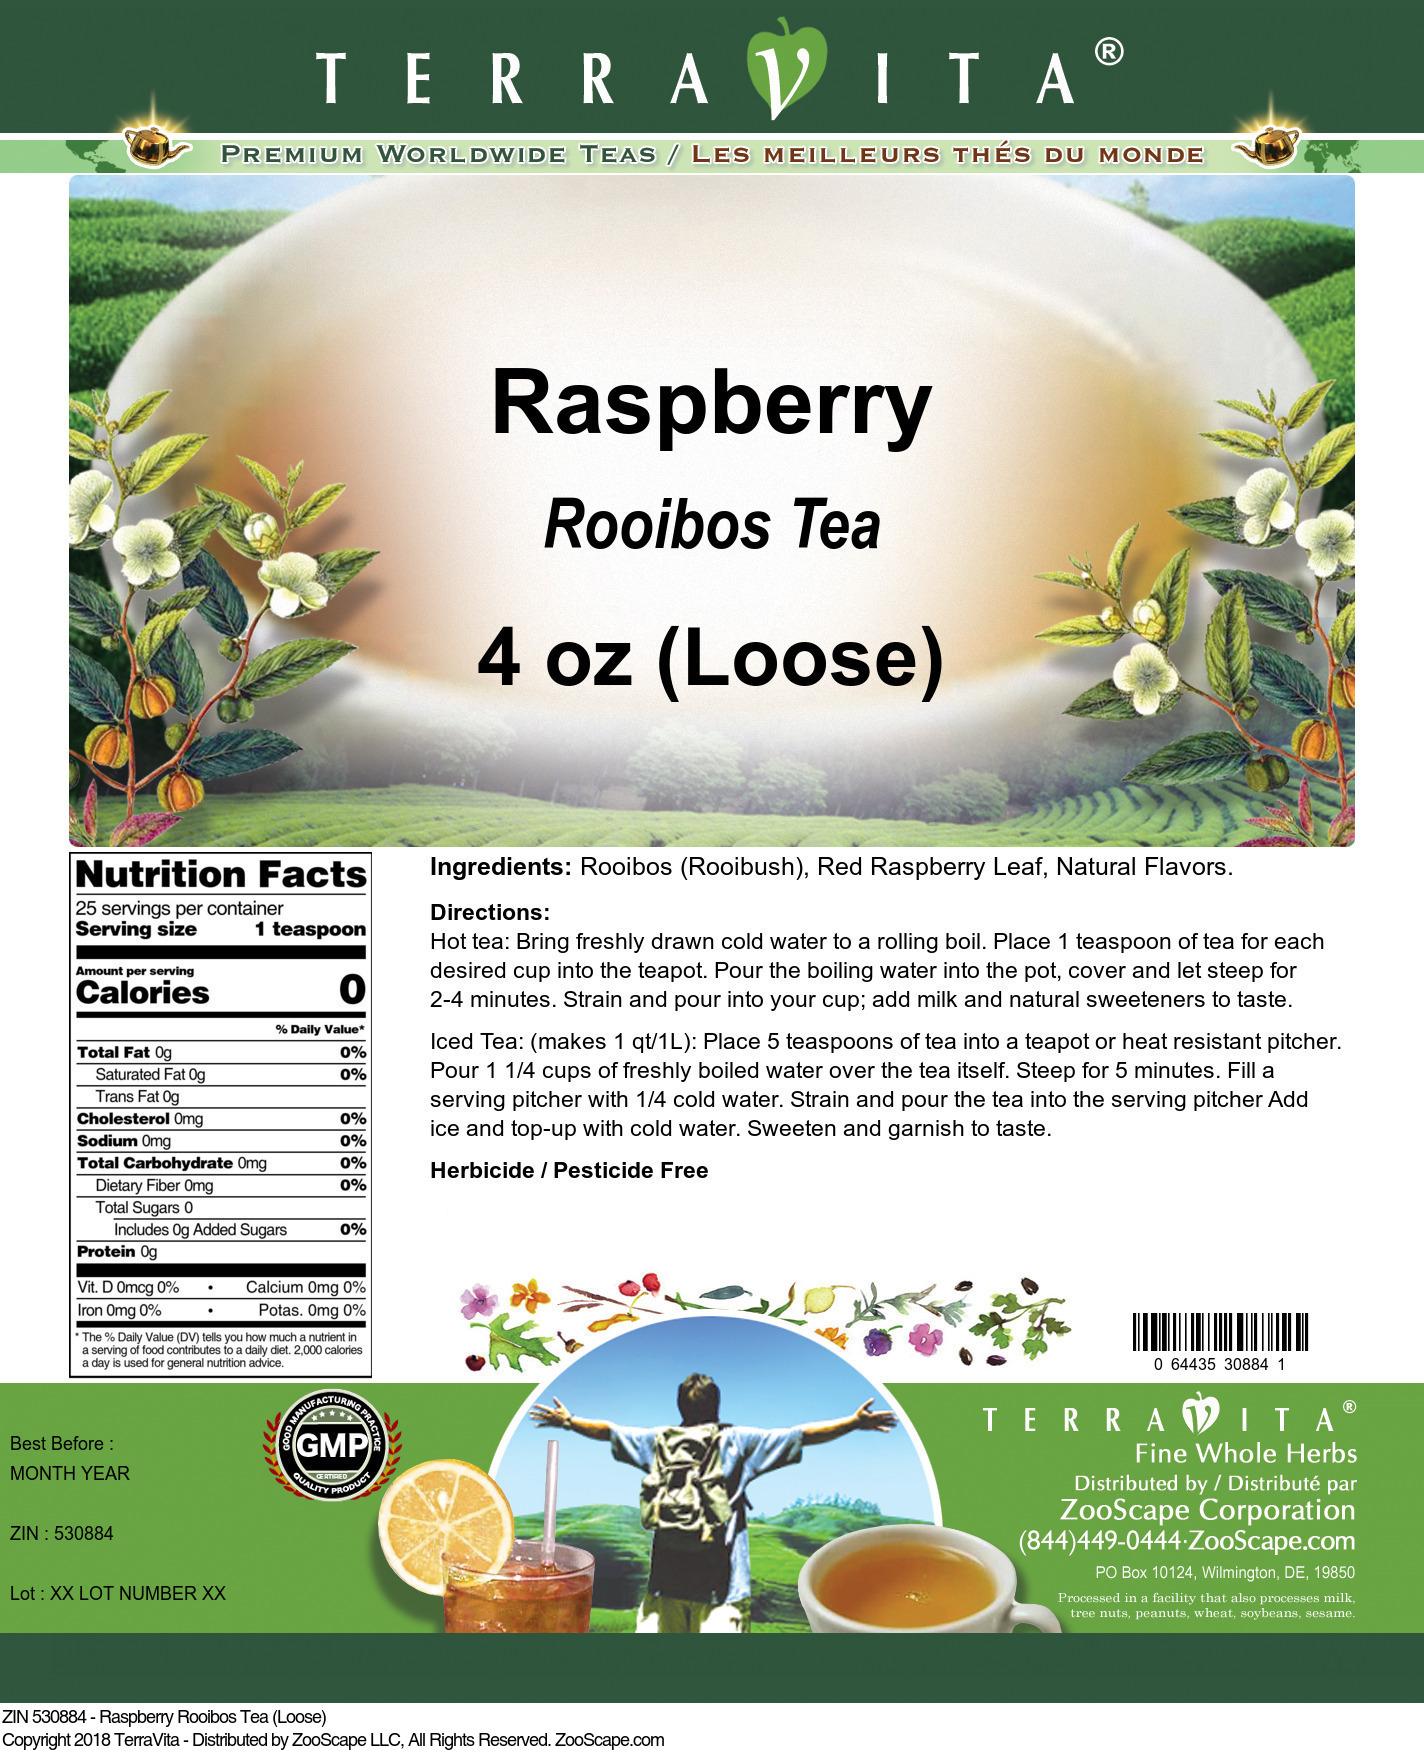 Raspberry Rooibos Tea